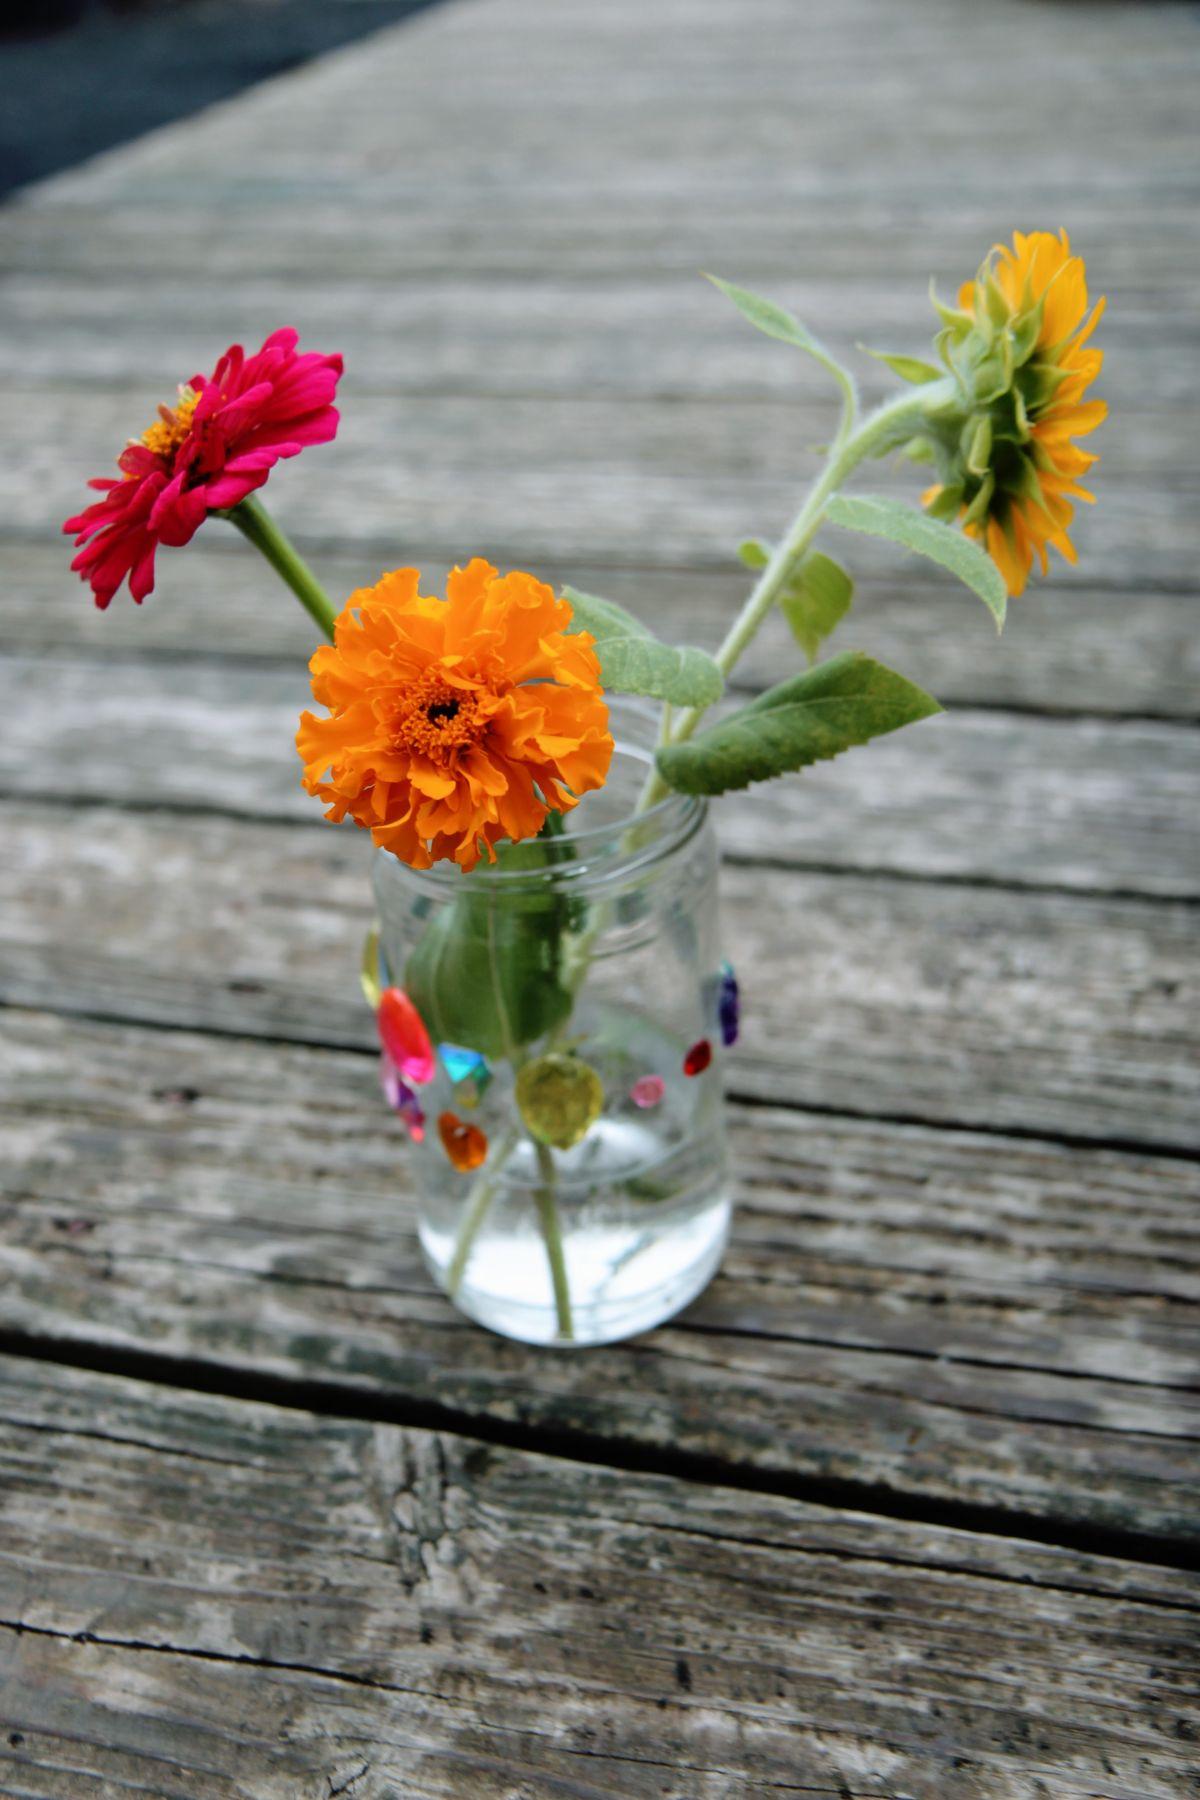 Deadhead Marigolds - Beautiful Summer Flower Vase with Orange Marigold, Pink Zinnia, Dwarf Sunflower